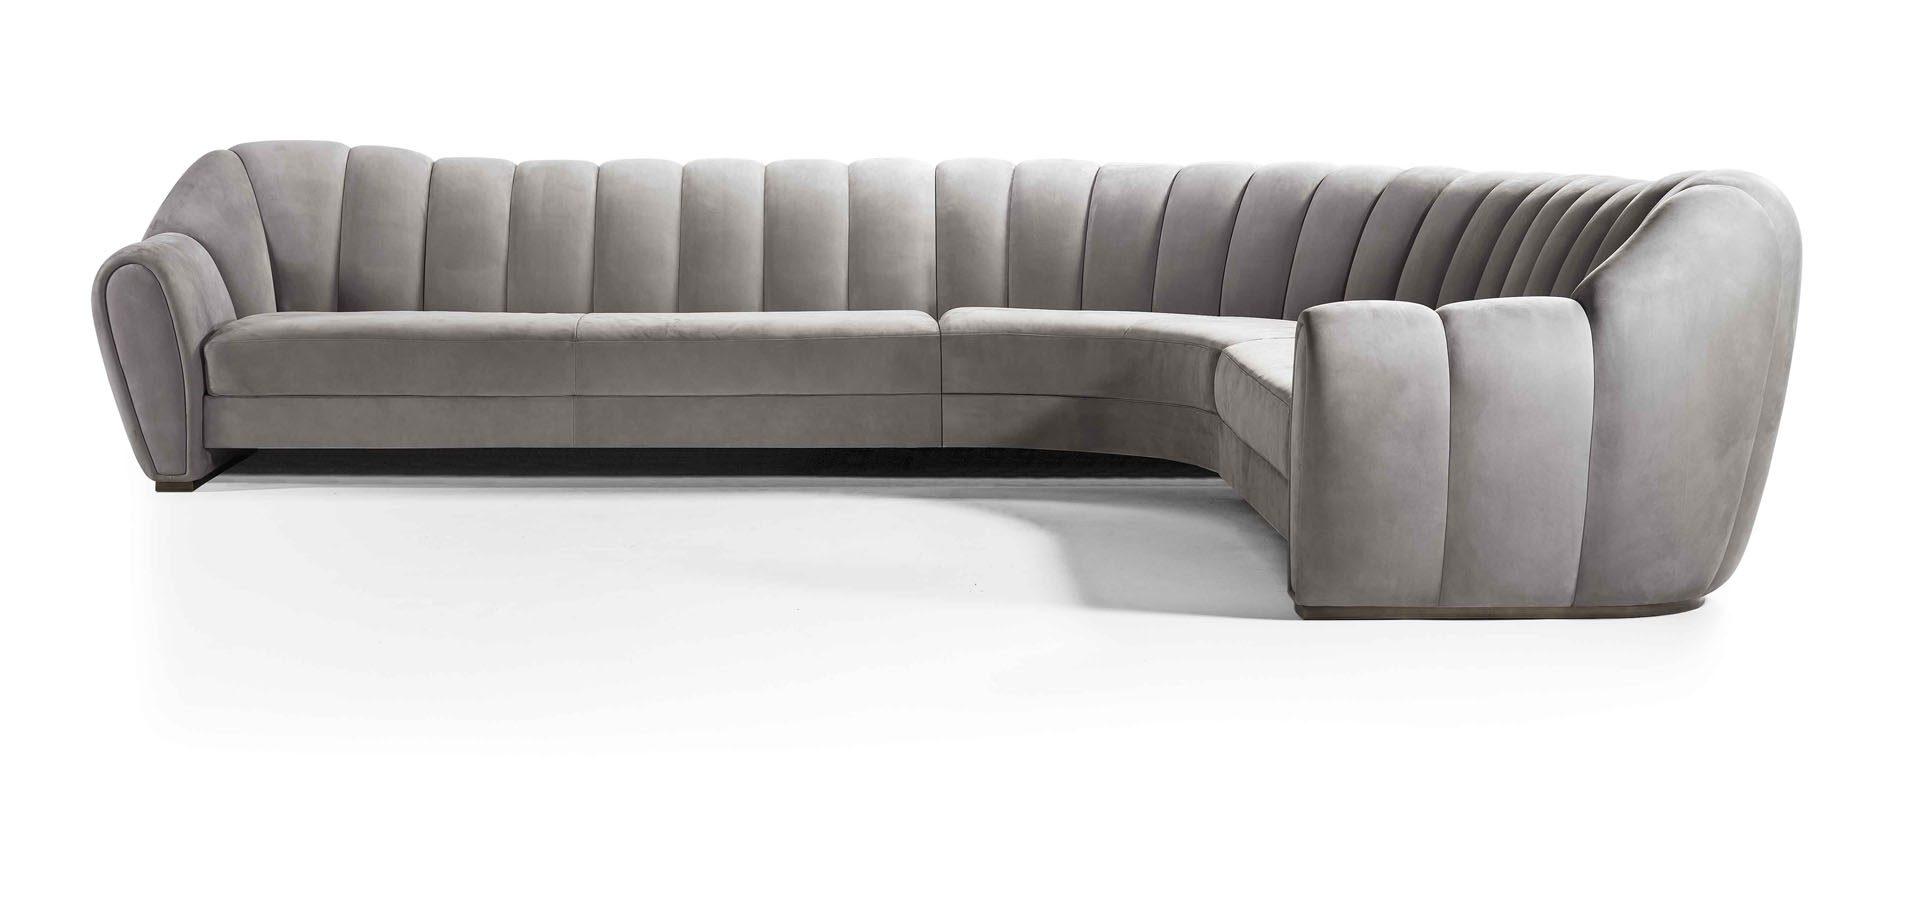 Fashion Affair Modular Lounge